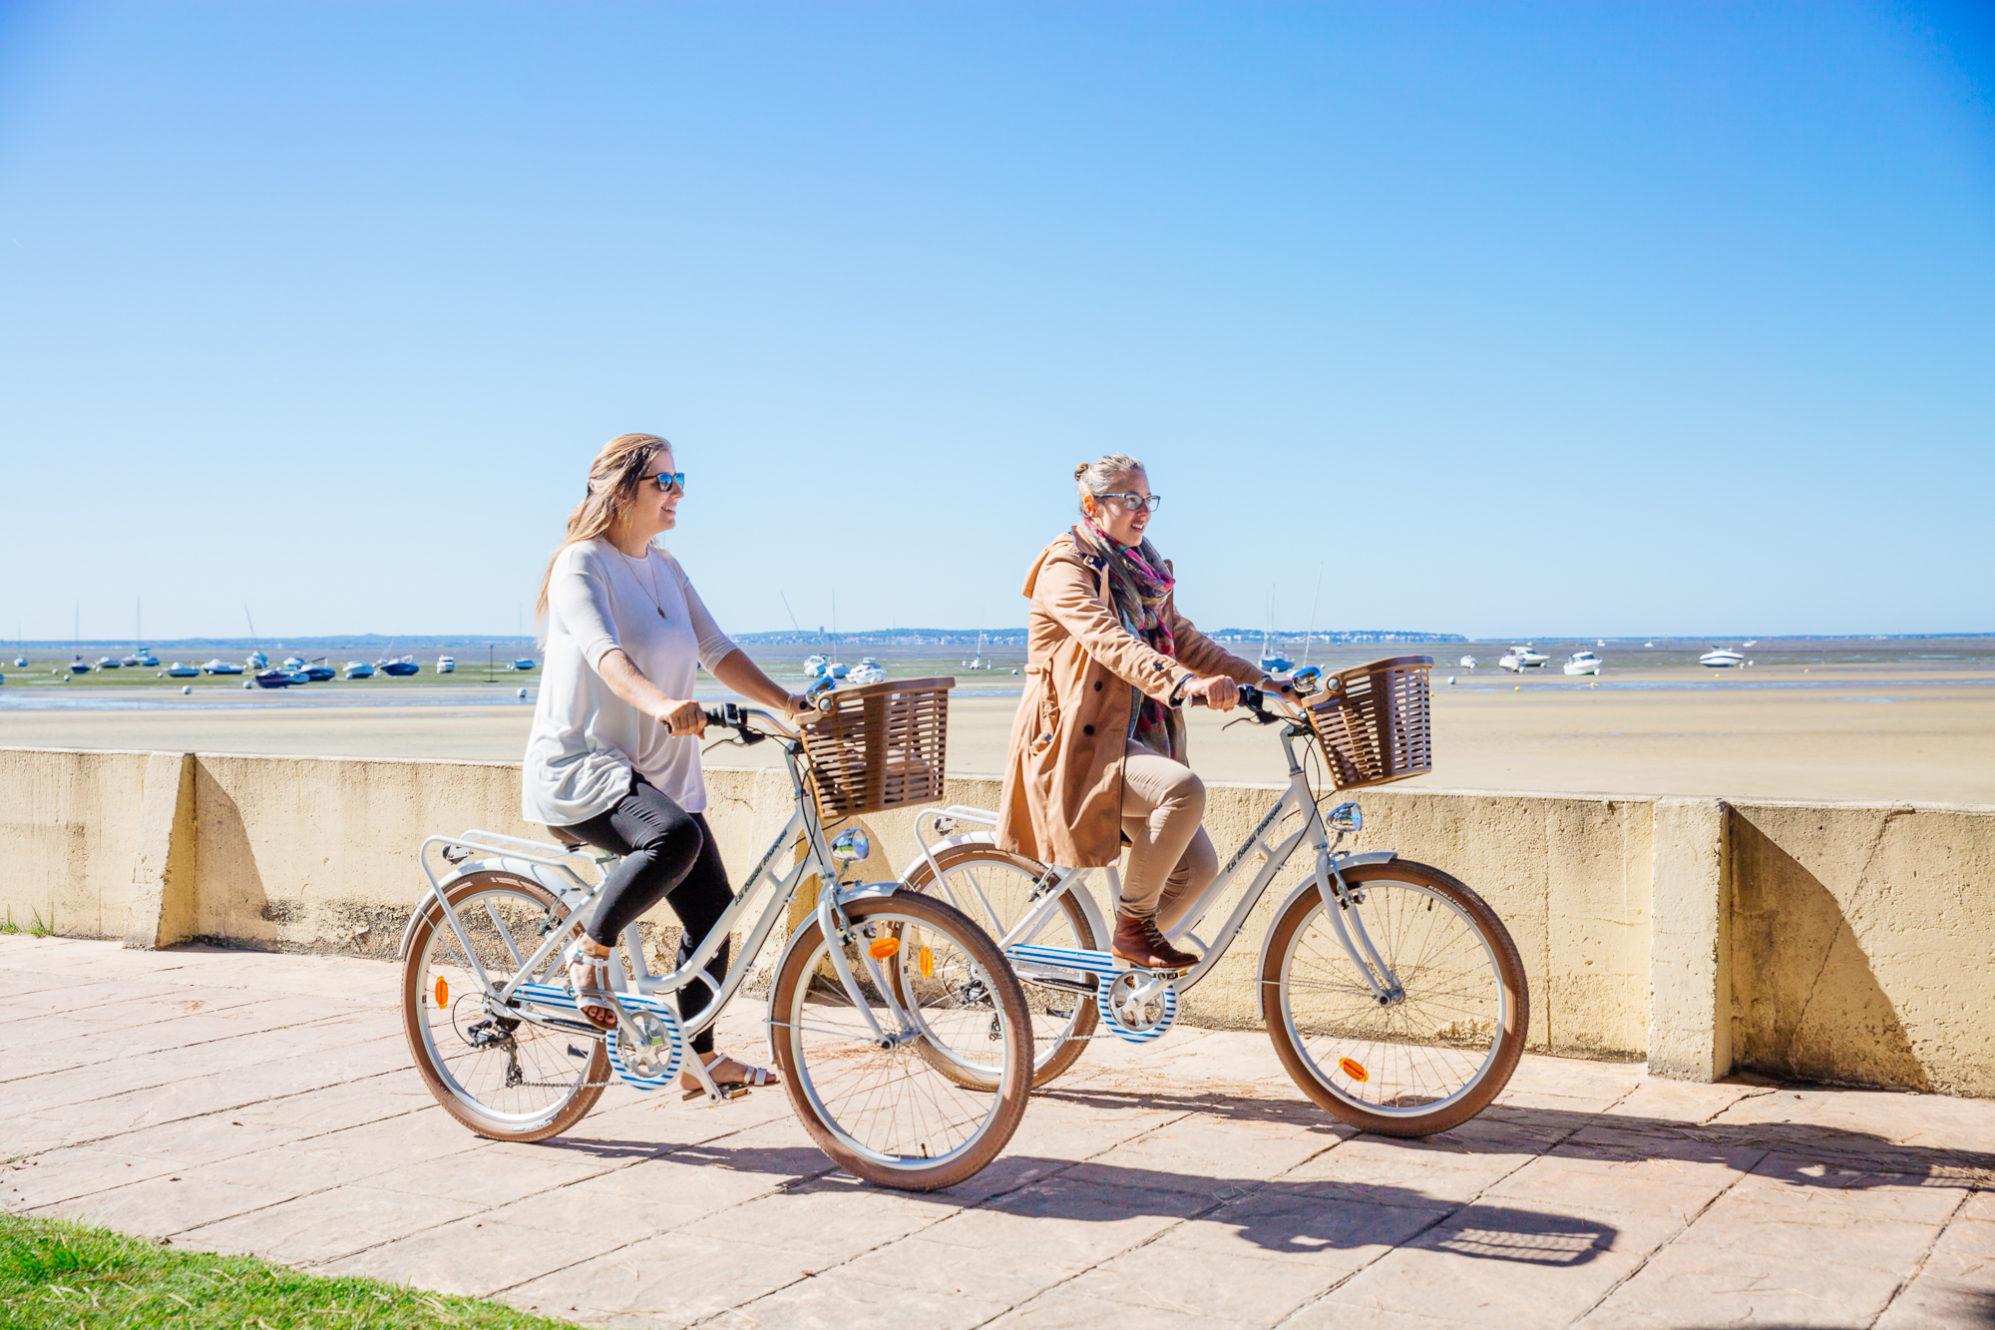 Amies faisant du vélo à Andernos